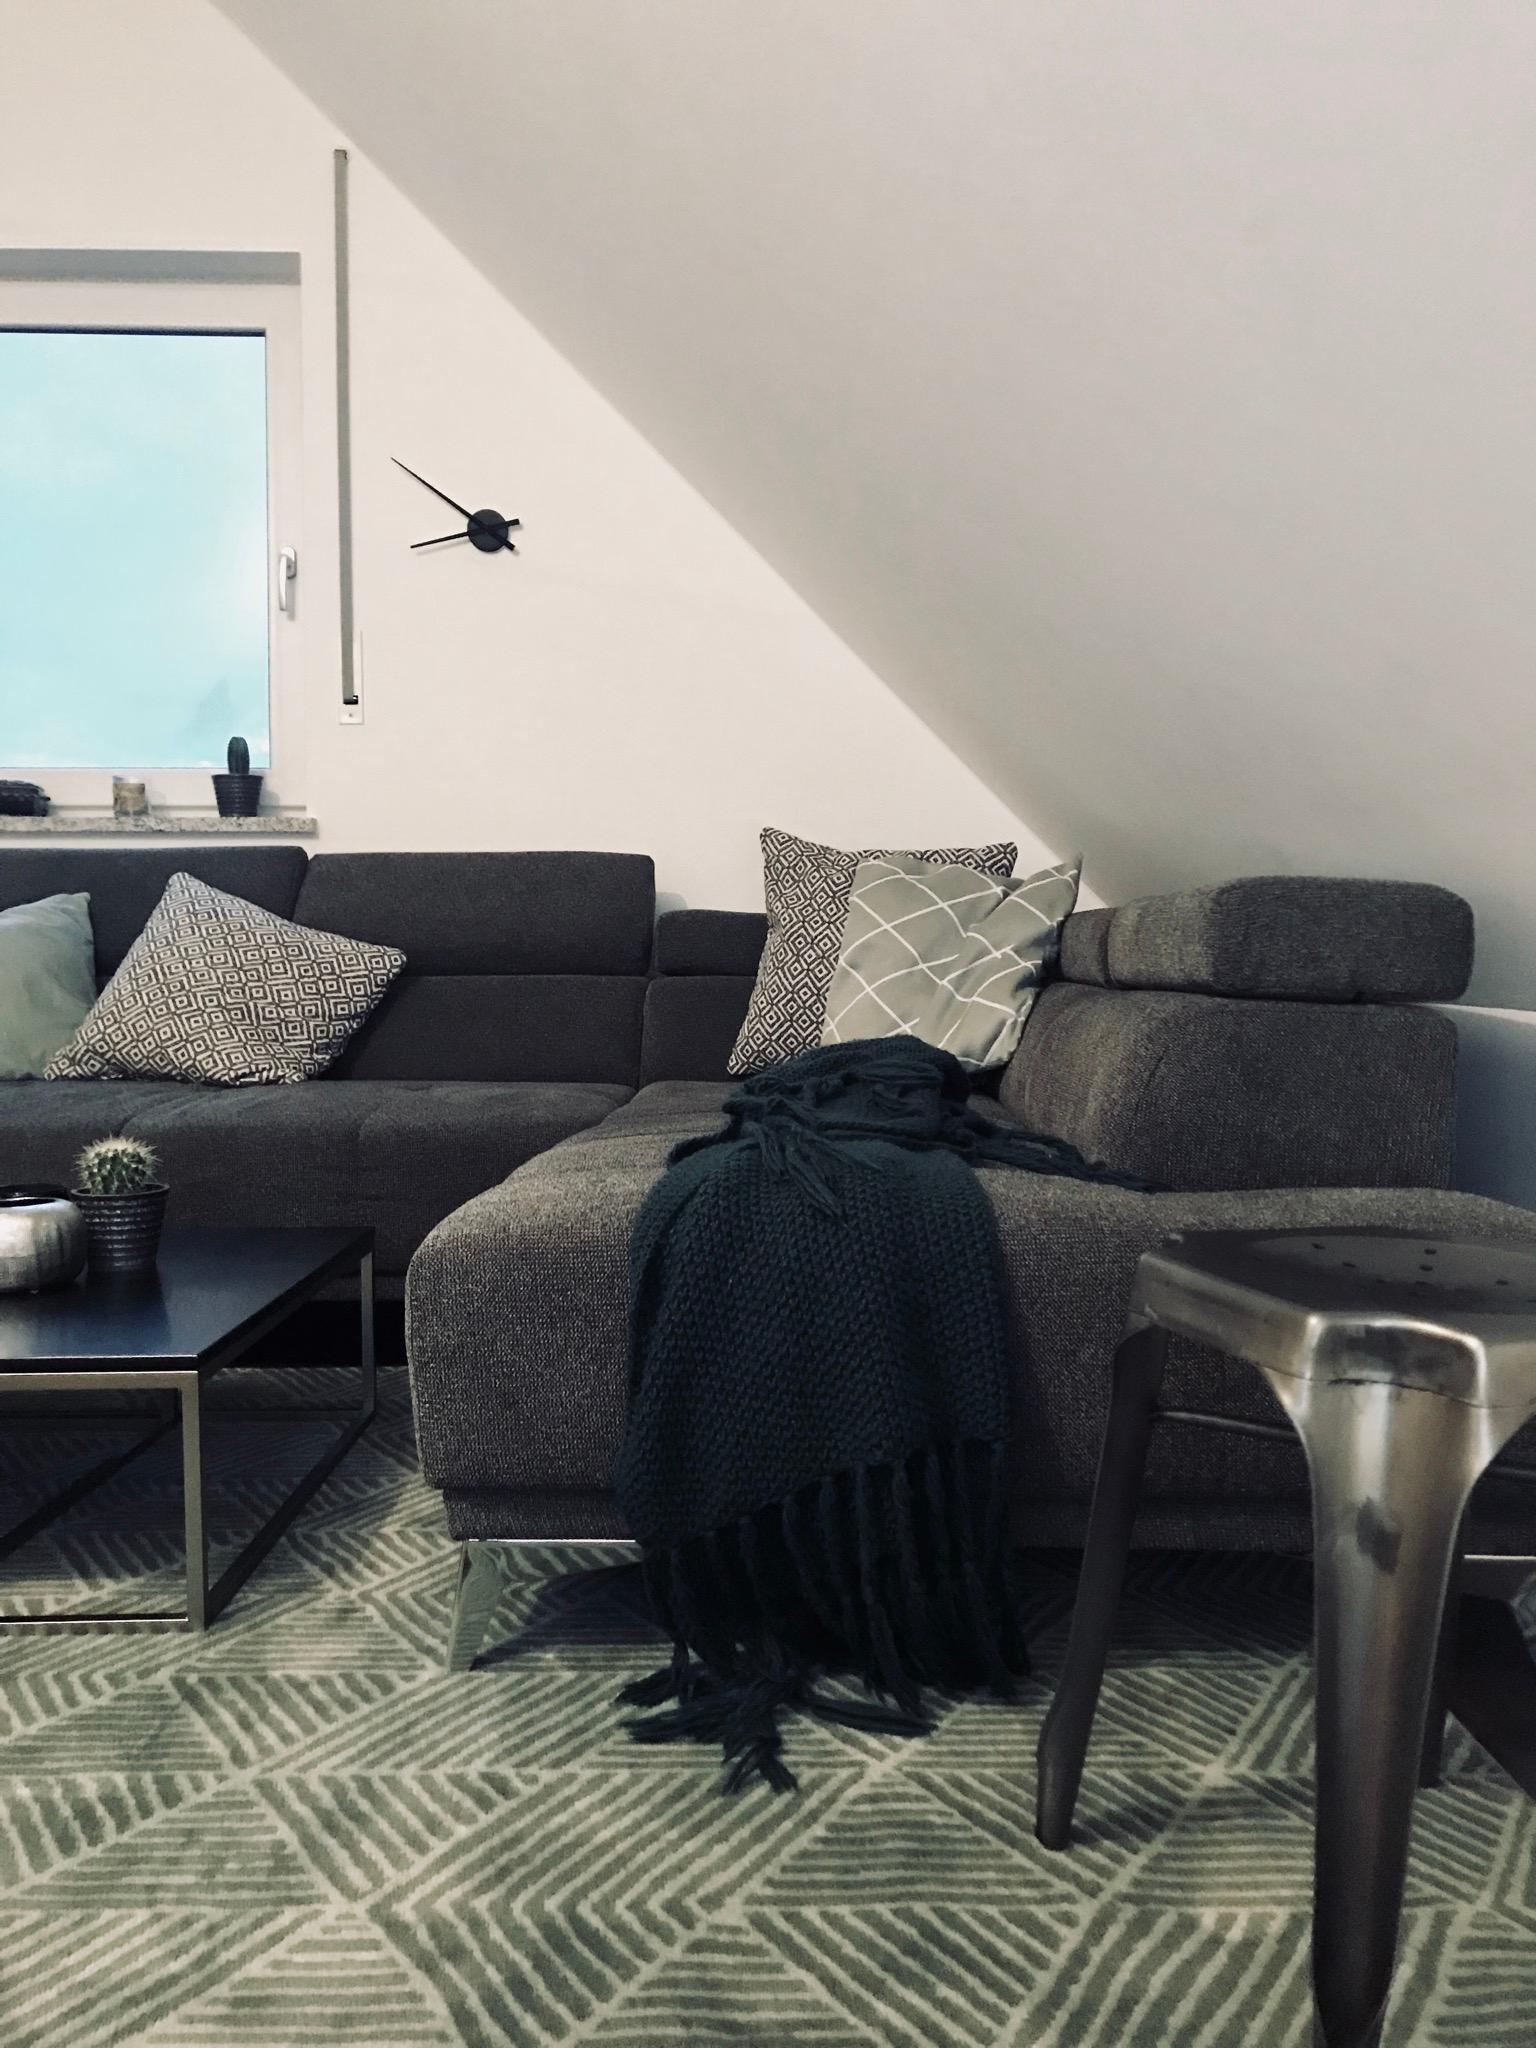 wohnzimmer livingroom dachgeschoss scandi kuschelecke couchstyle